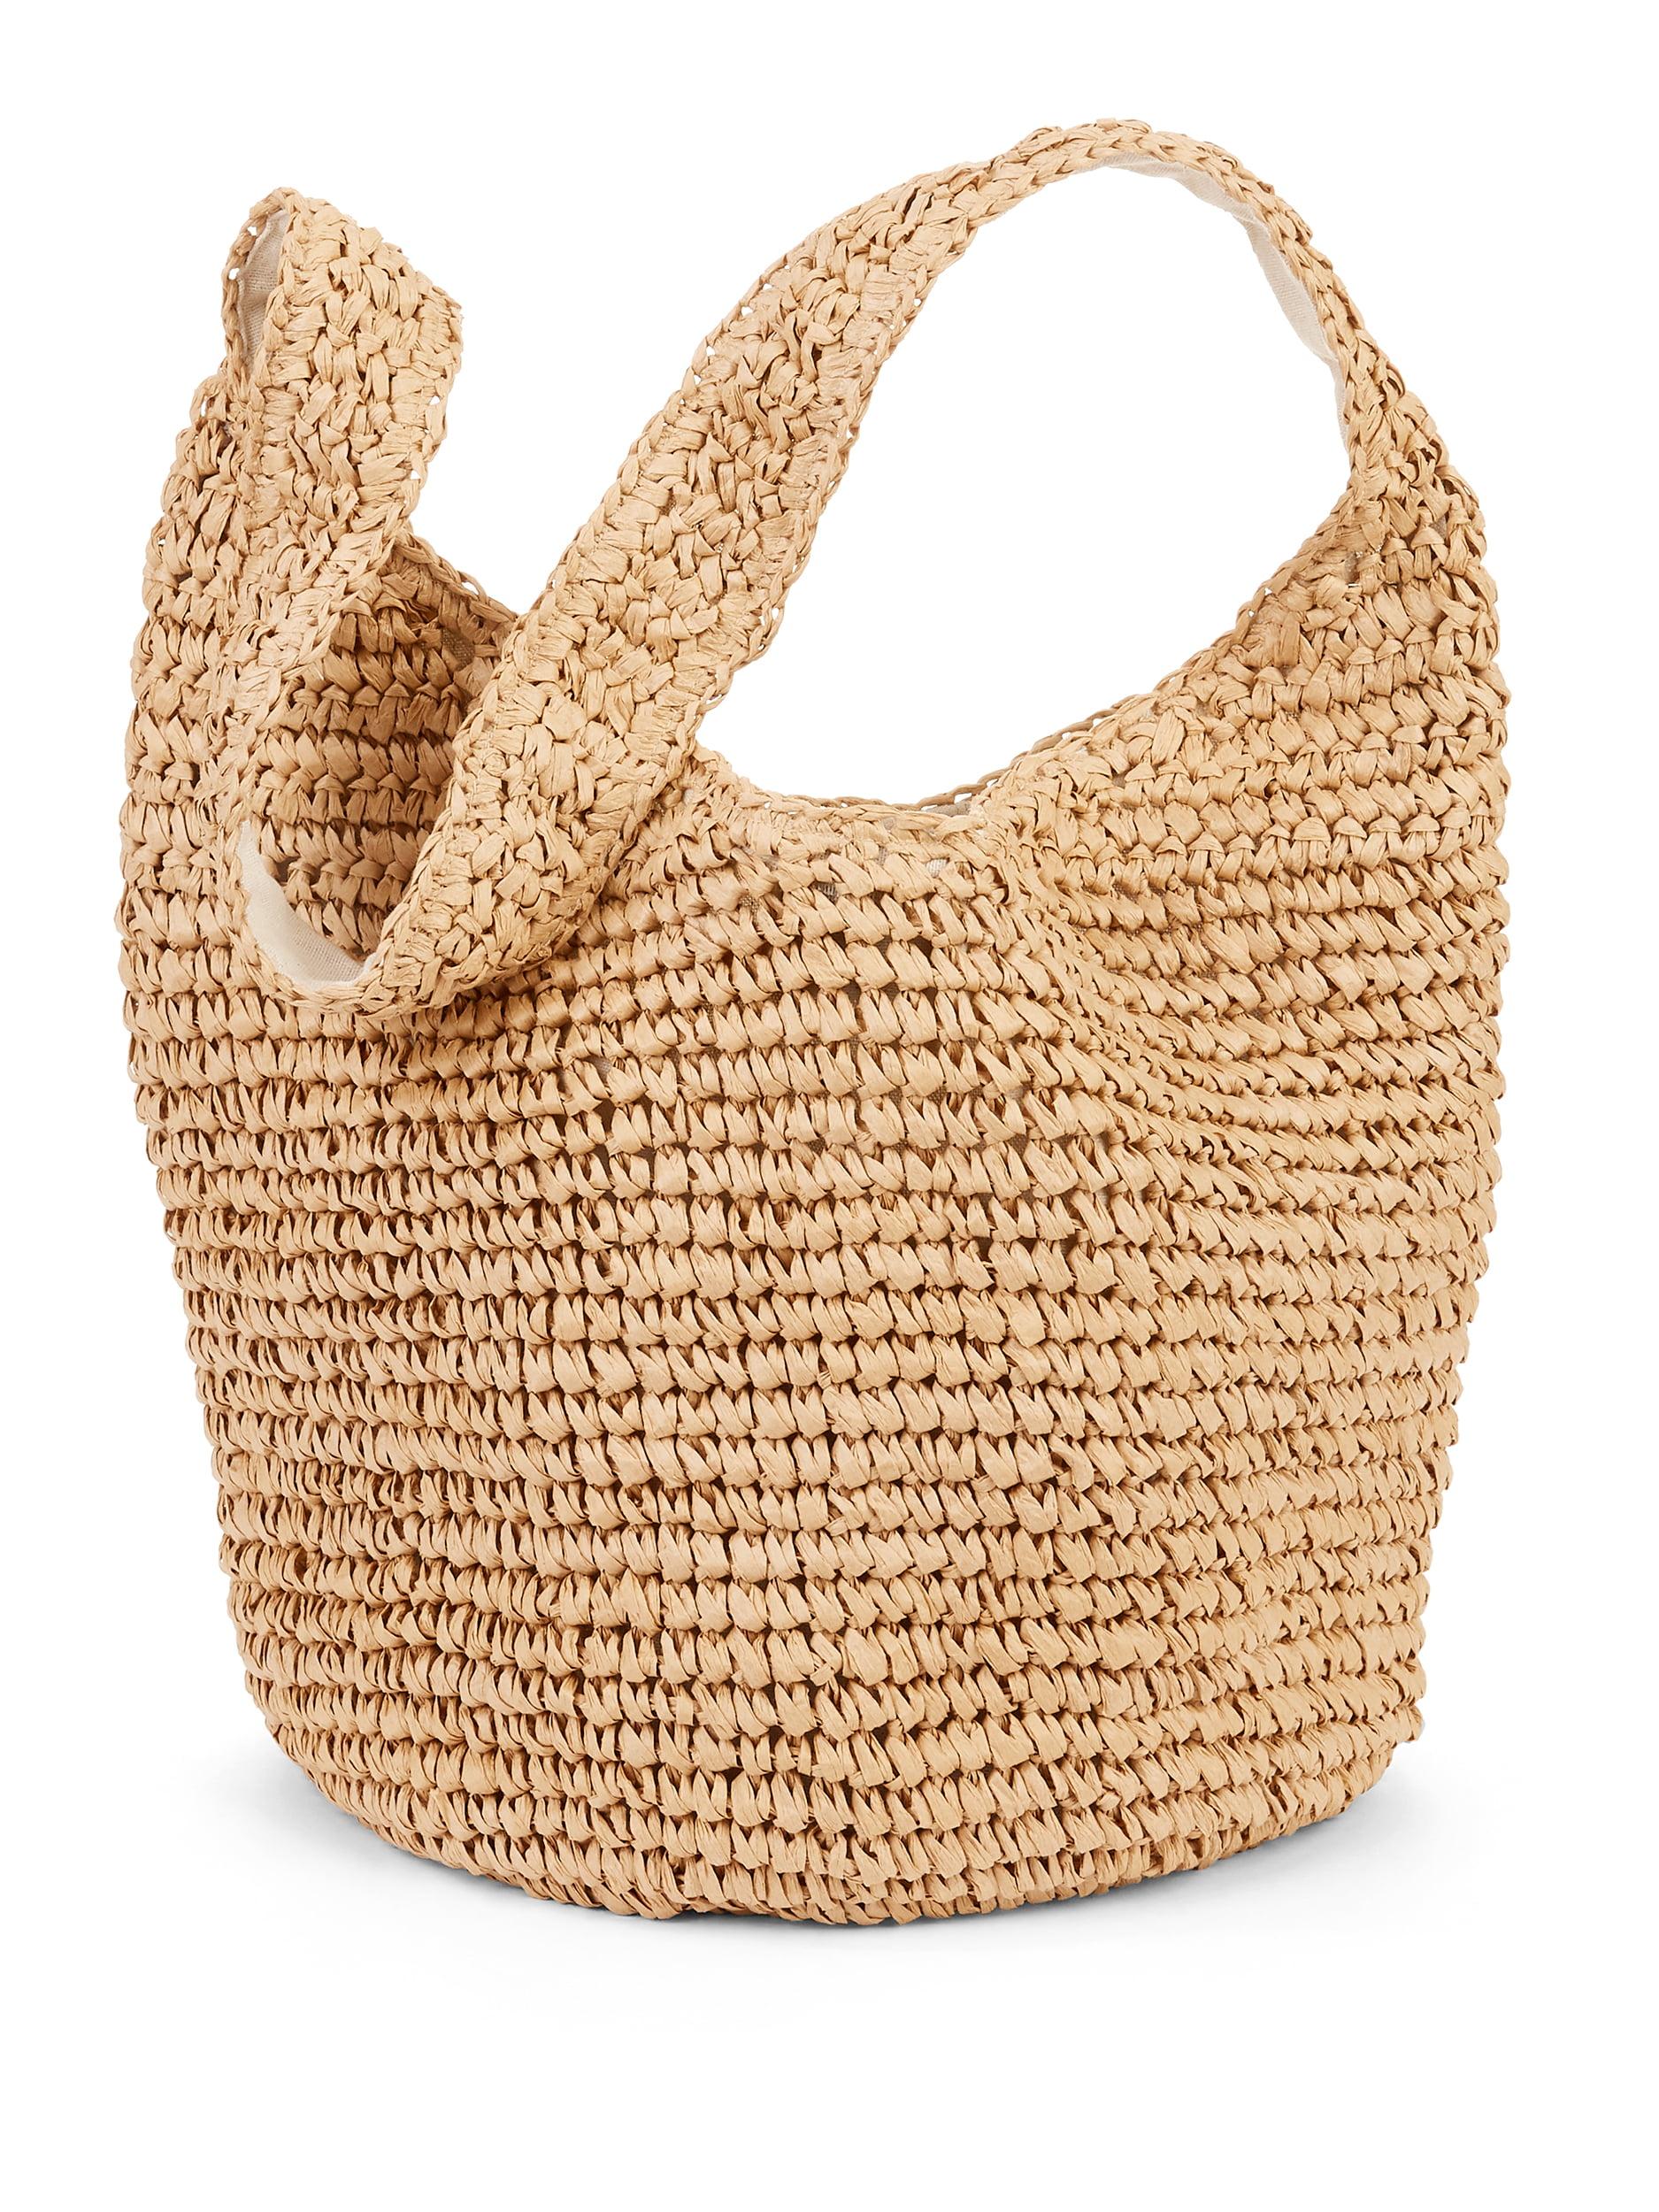 Eliza May Rose Sienna Bag